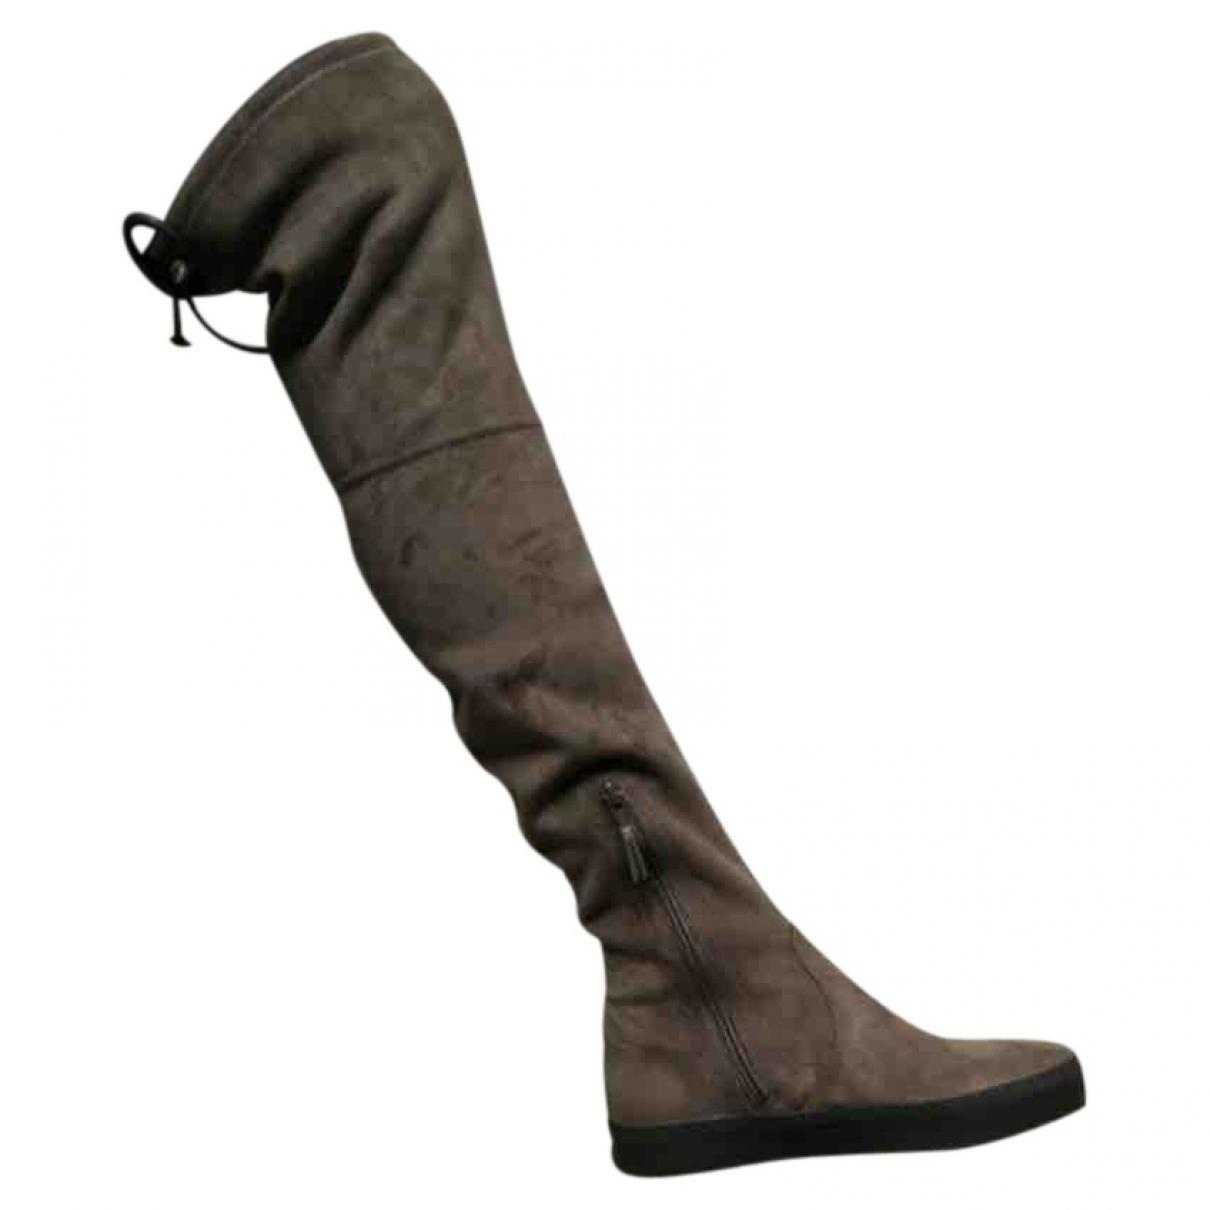 Stuart Weitzman \N Camel Suede Boots for Women 36 EU